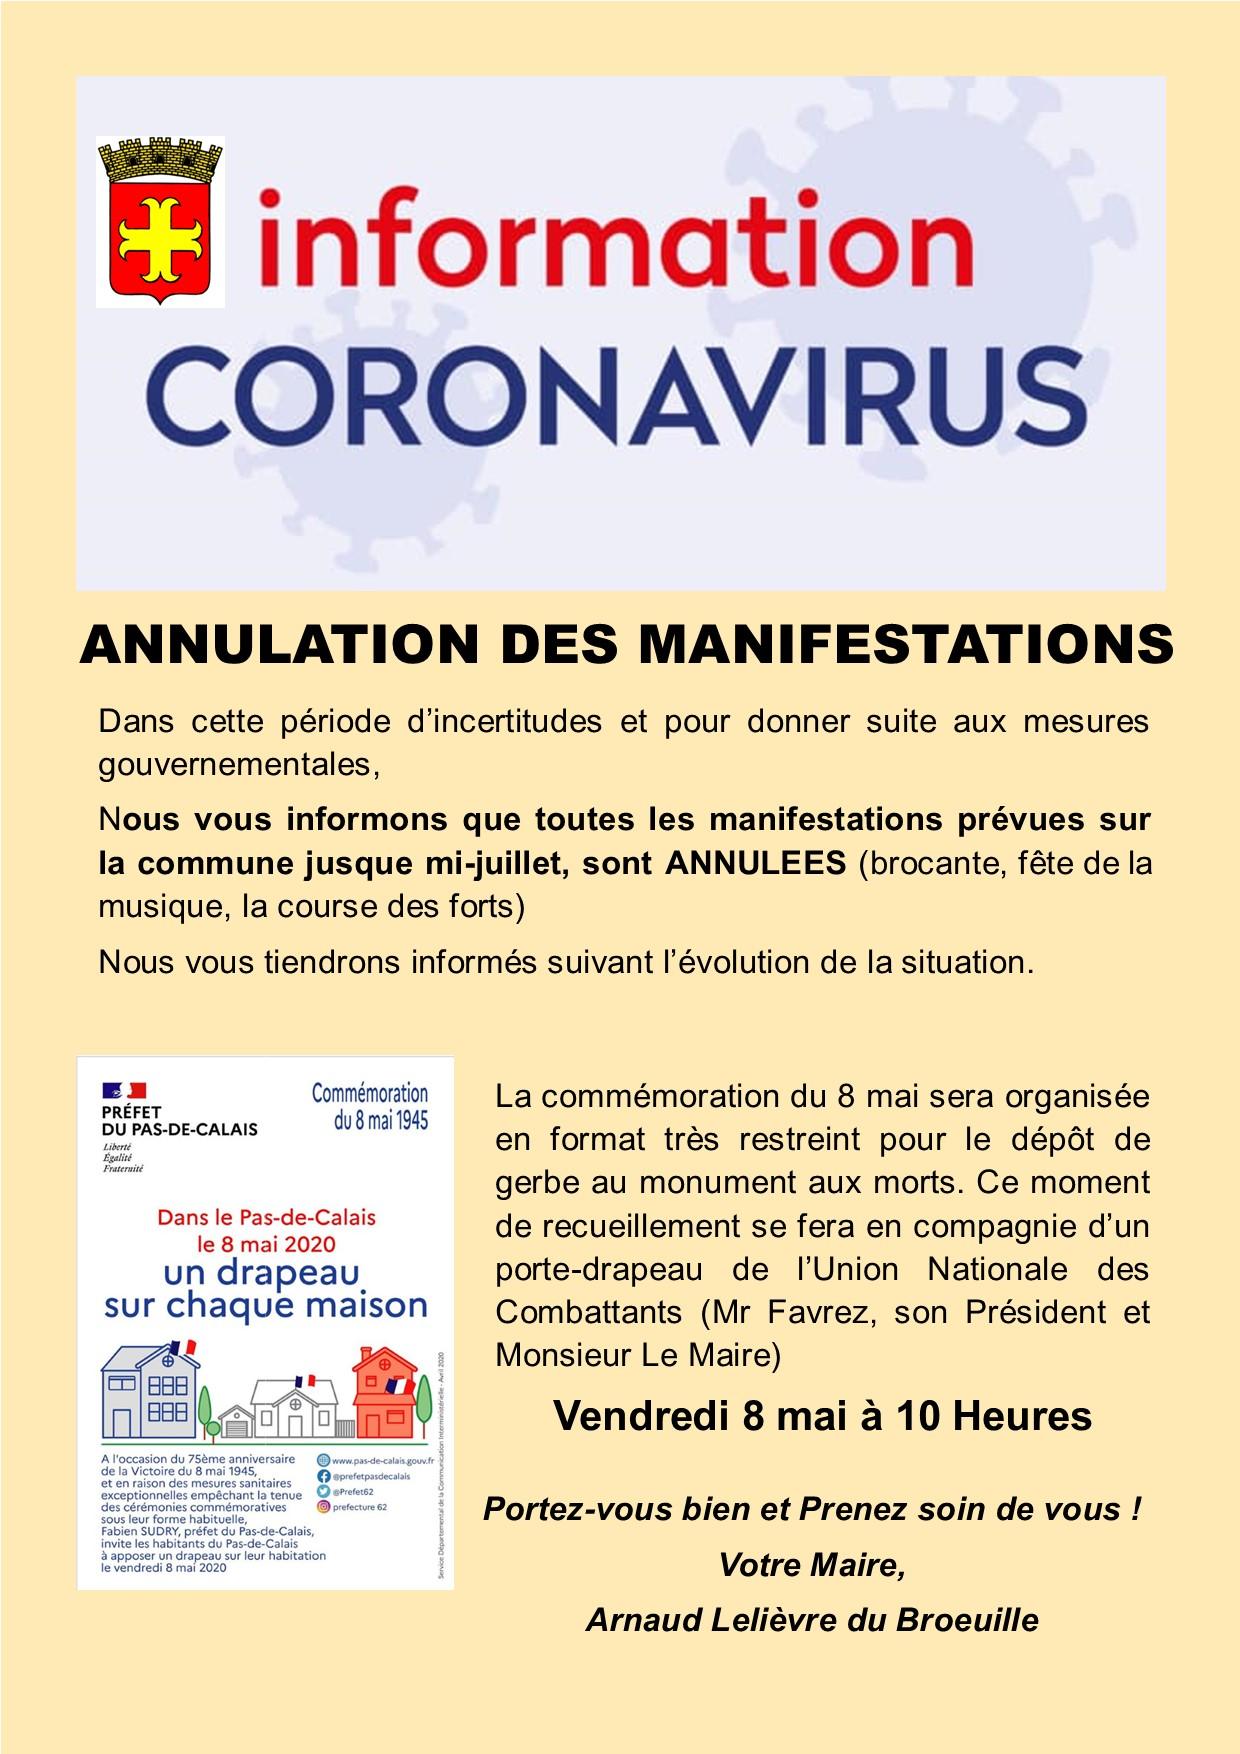 INFOS CORONAVIRUS 02052020.jpg